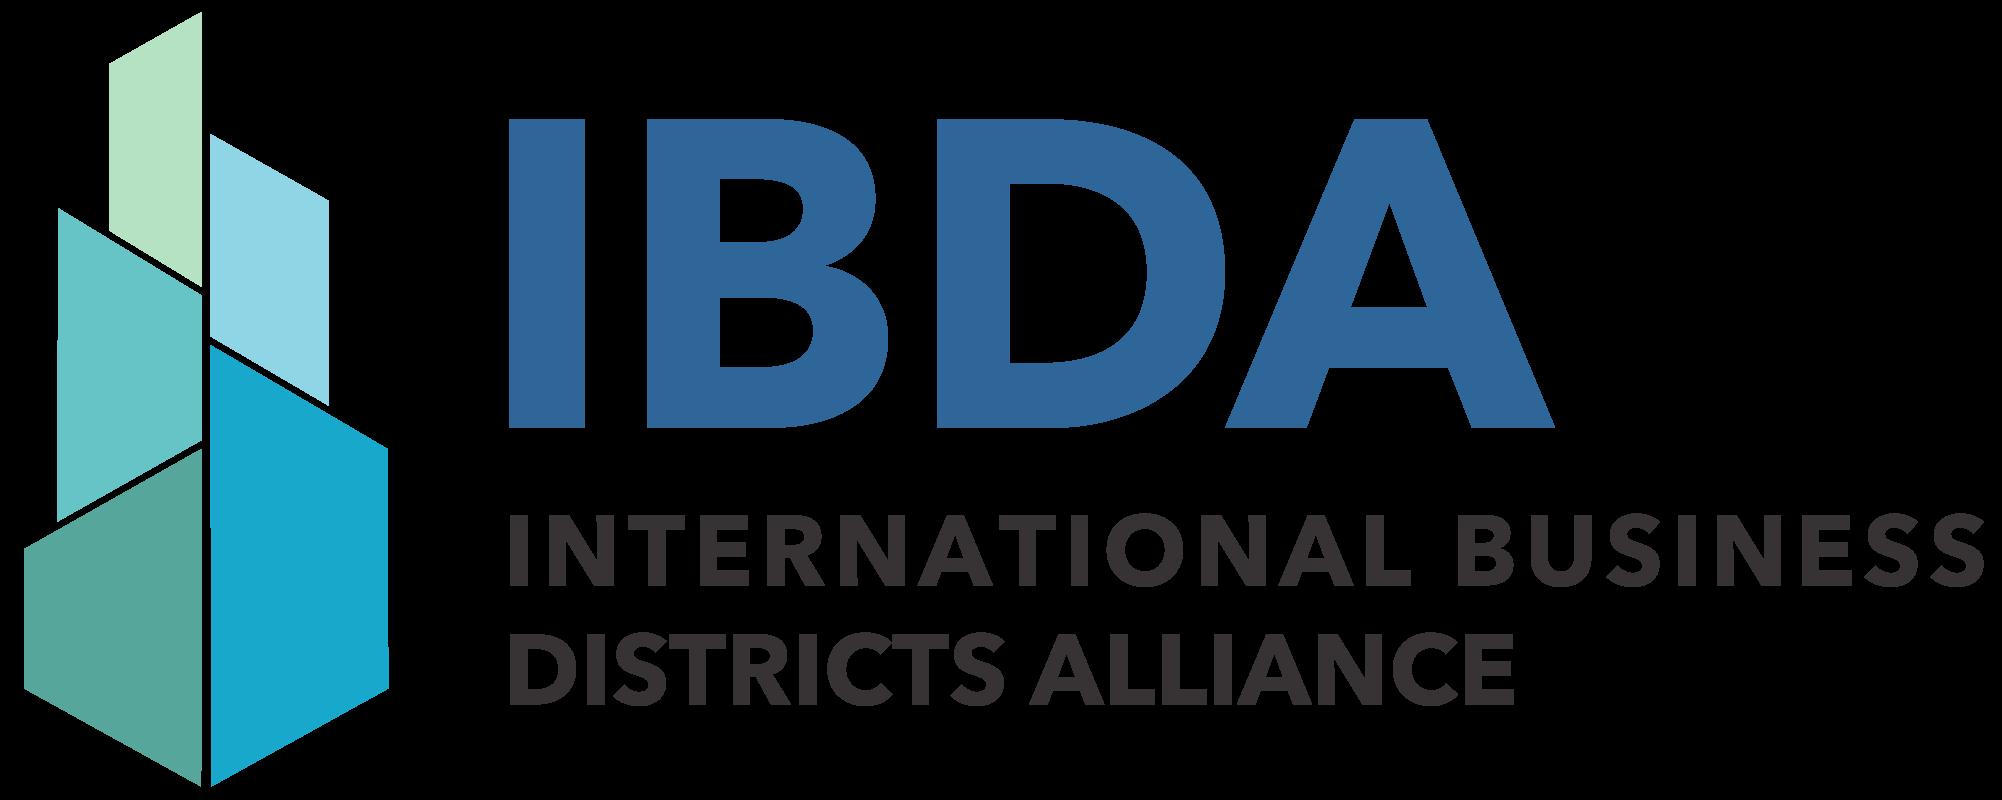 IBDA - International Business District Alliance